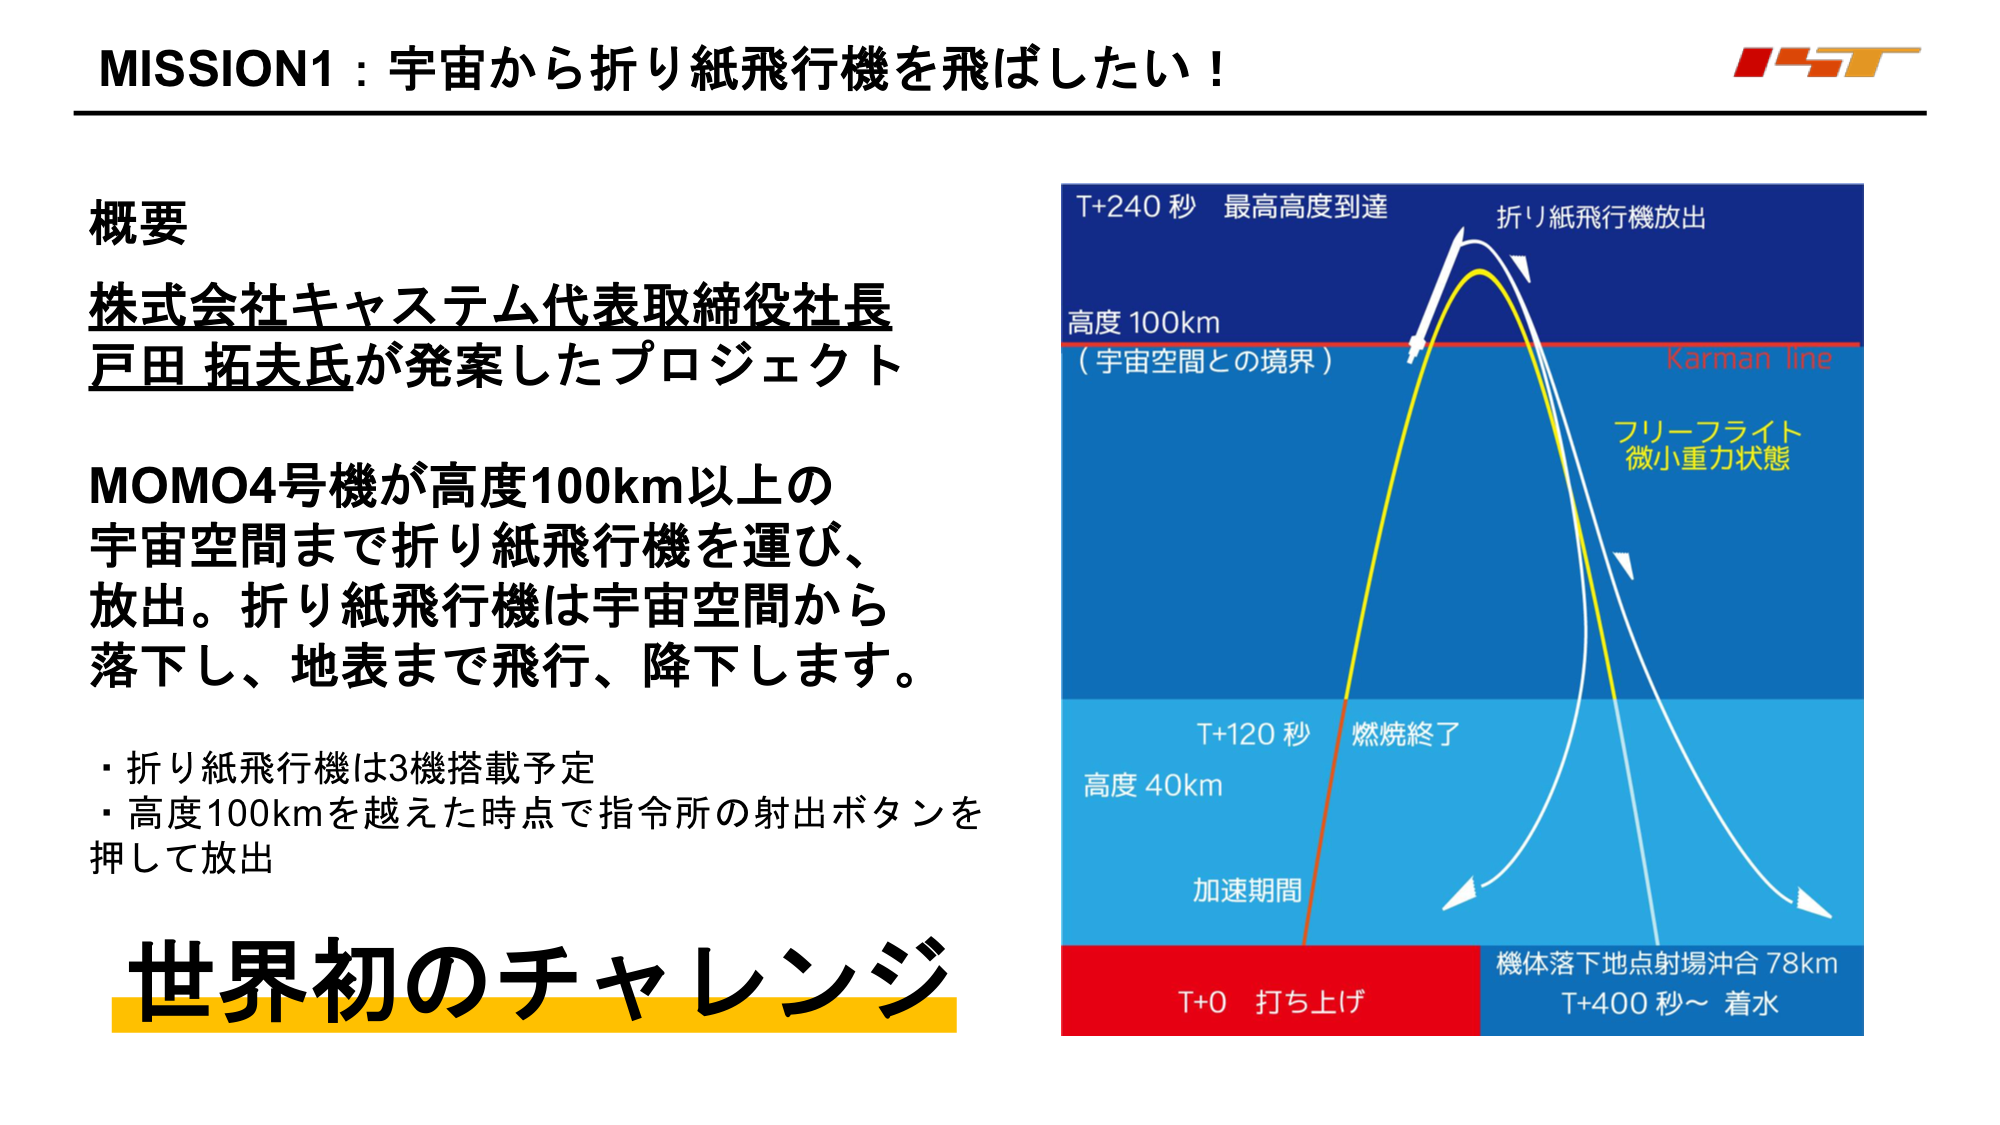 f:id:Imamura:20190628161155p:plain